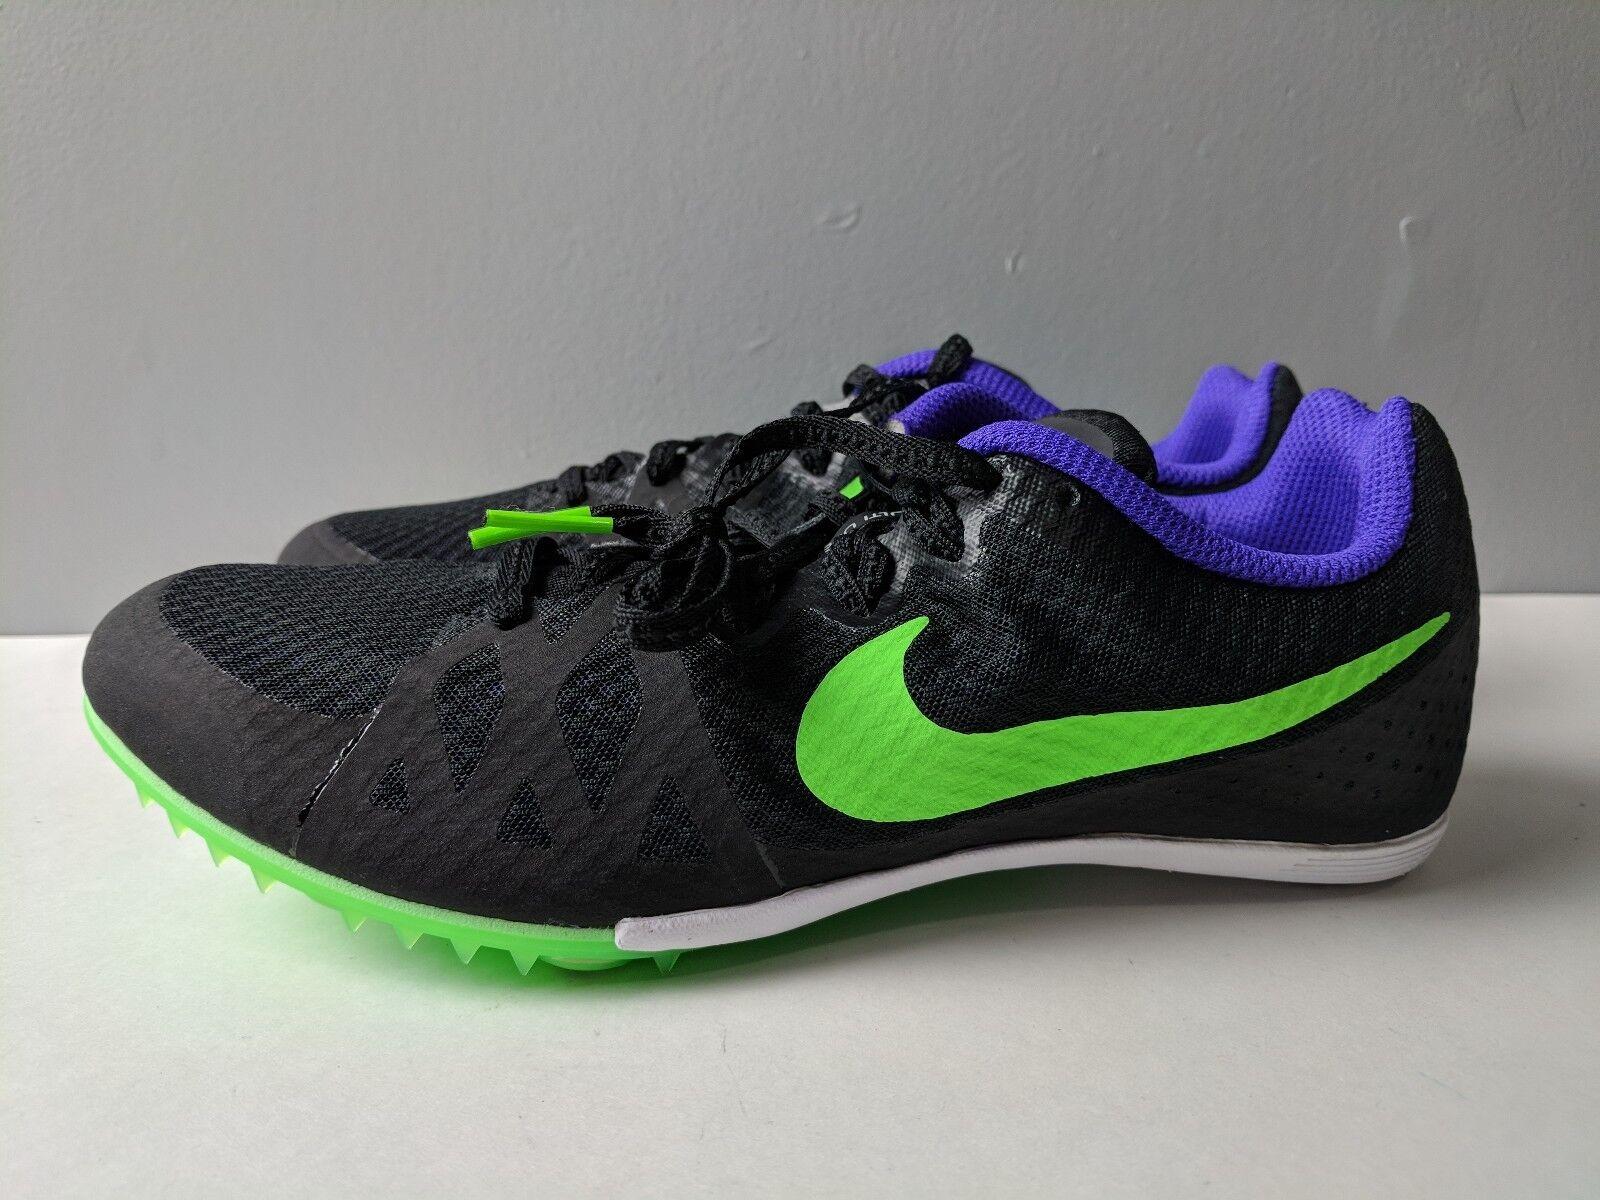 Nike Zoom Rival M 8 Black /Fierce Purple Brand New Comfortable